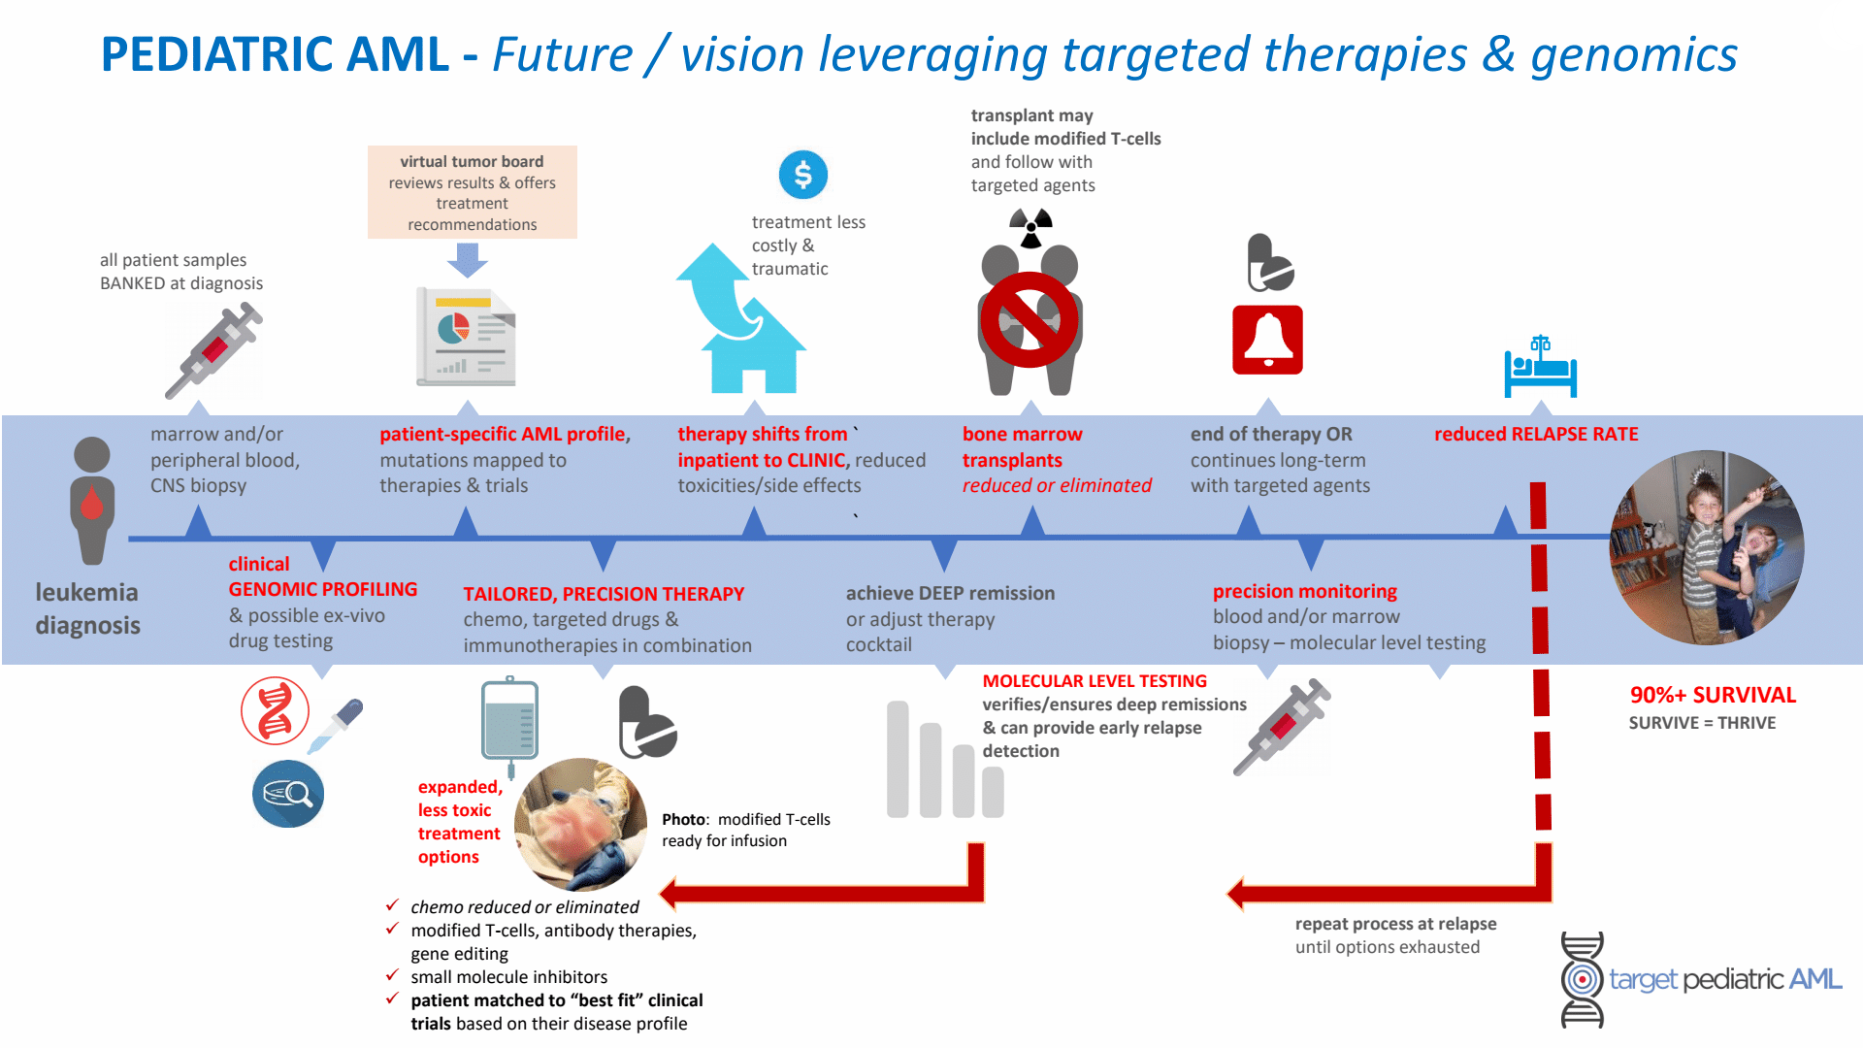 Target Pediatric AML's vision